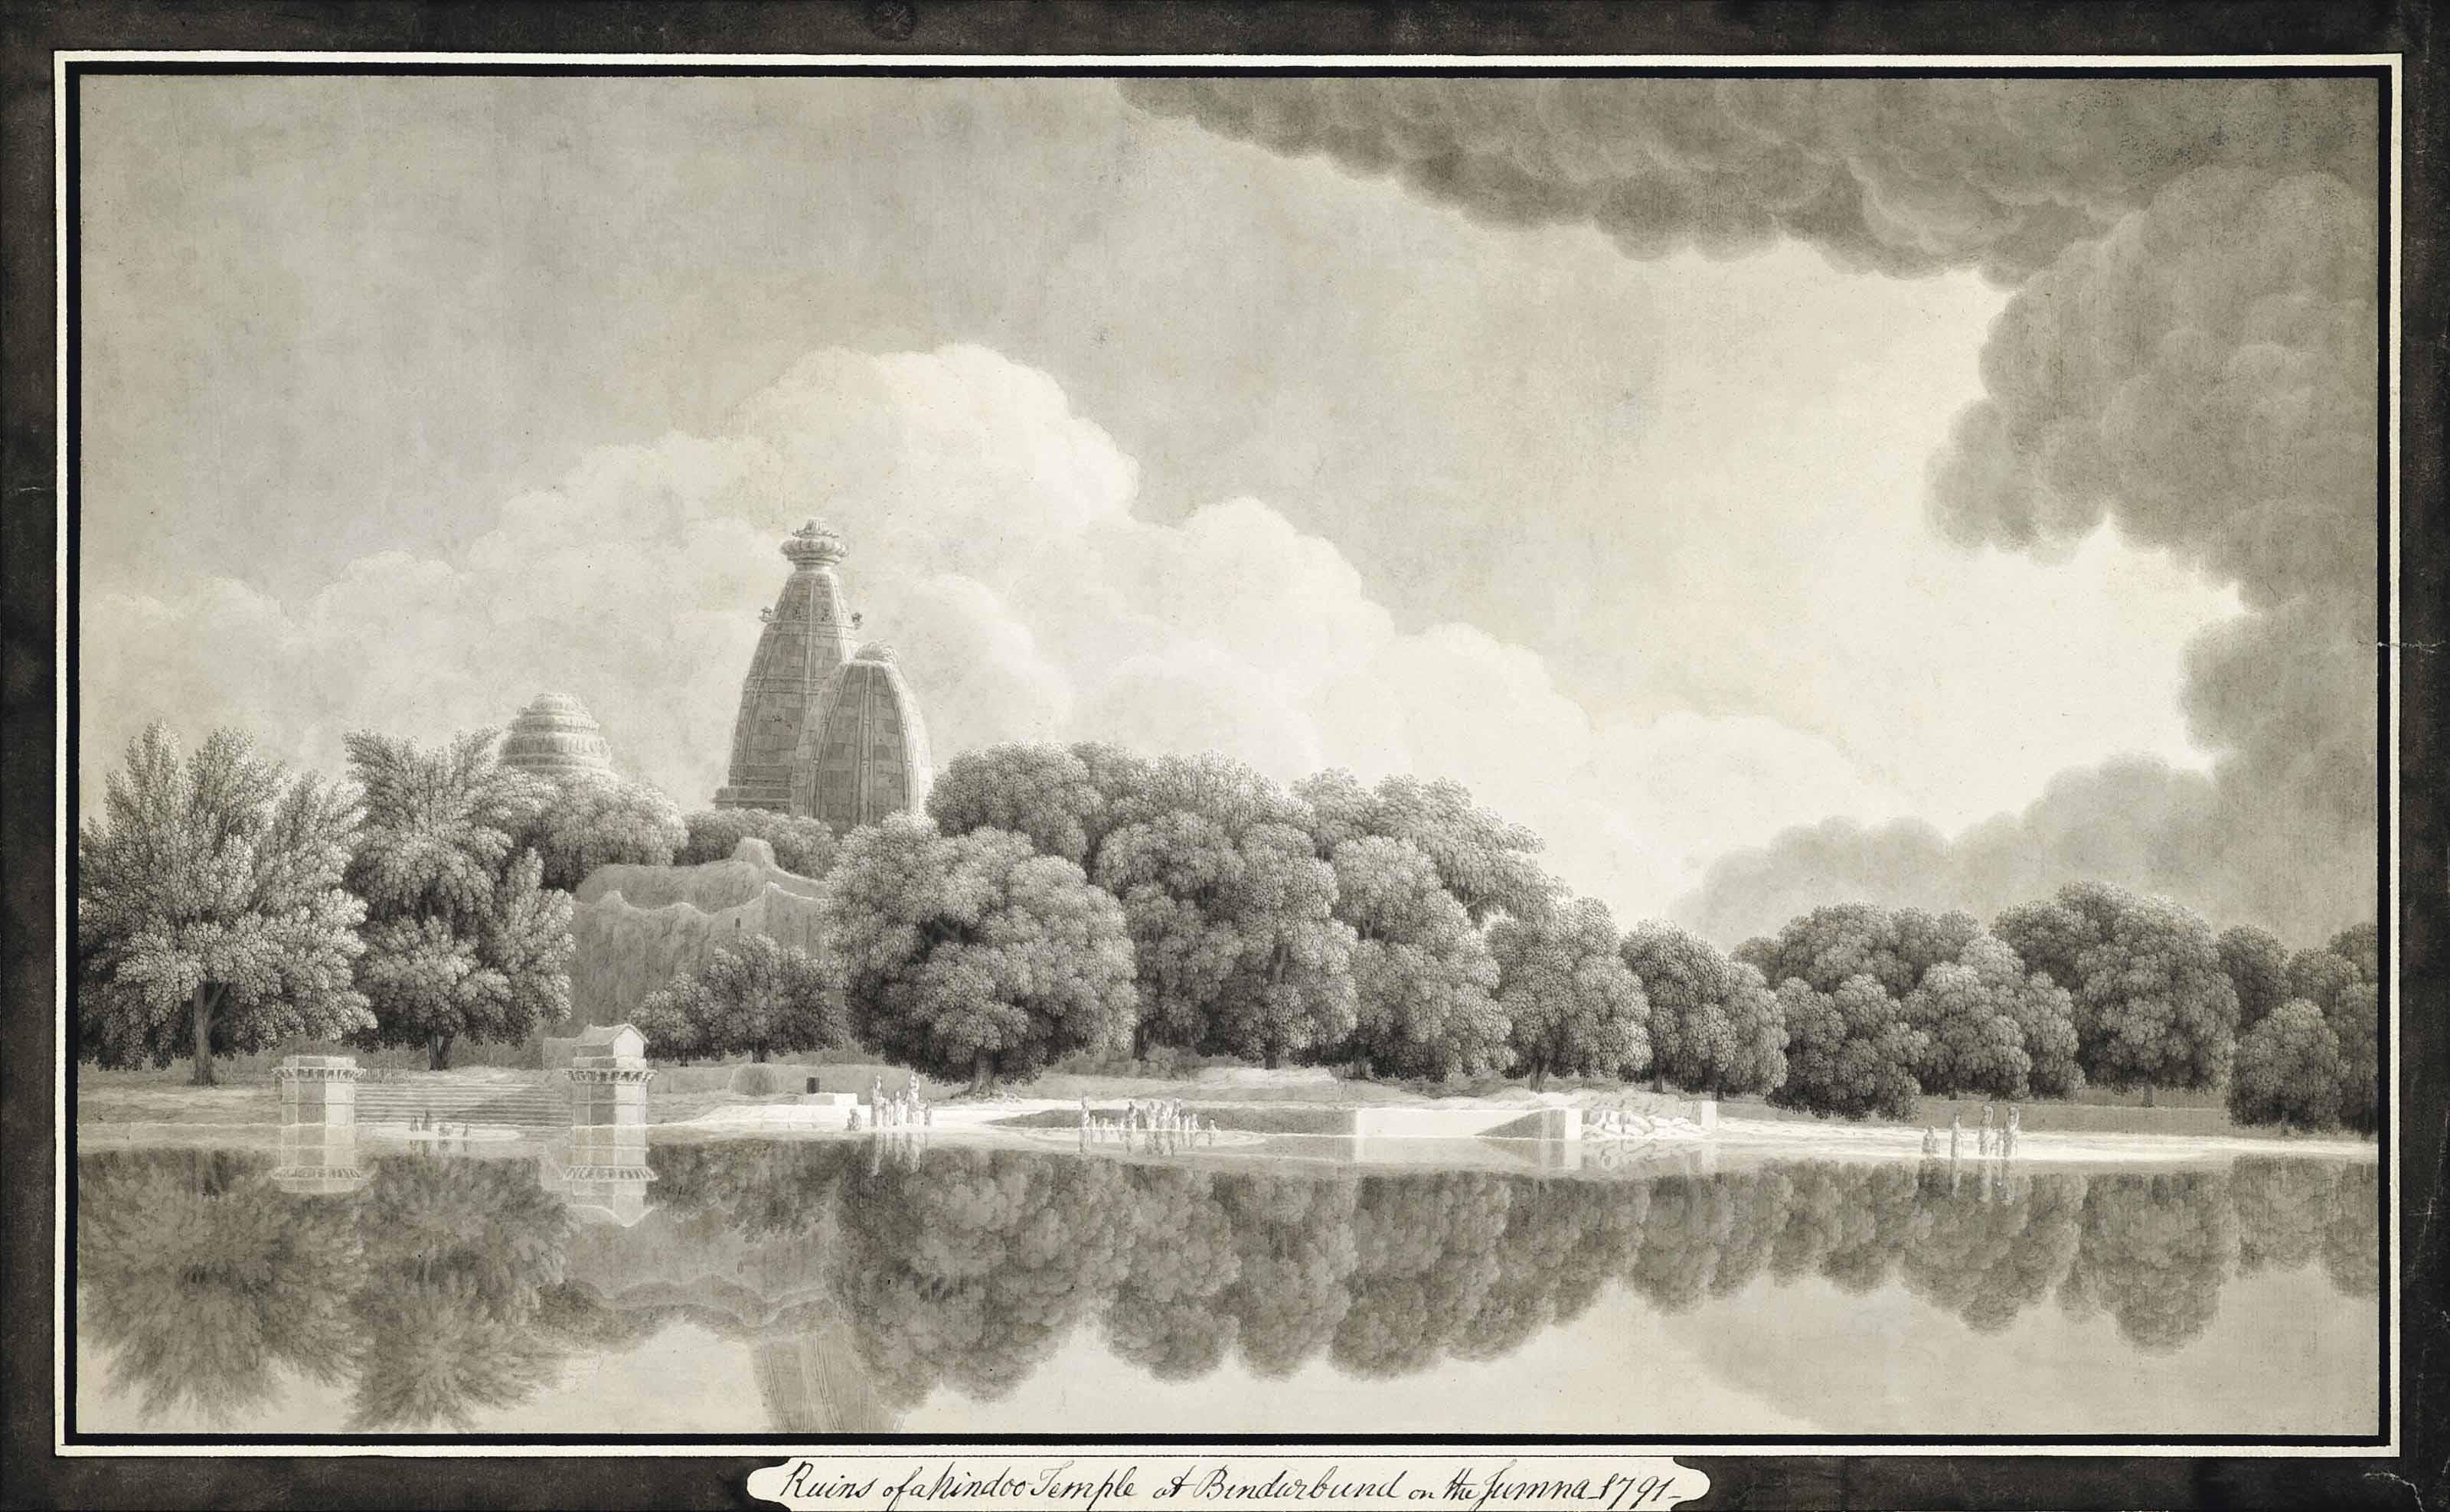 Ruins of a Hindu temple at Bindurbund on the Jumna, 1791